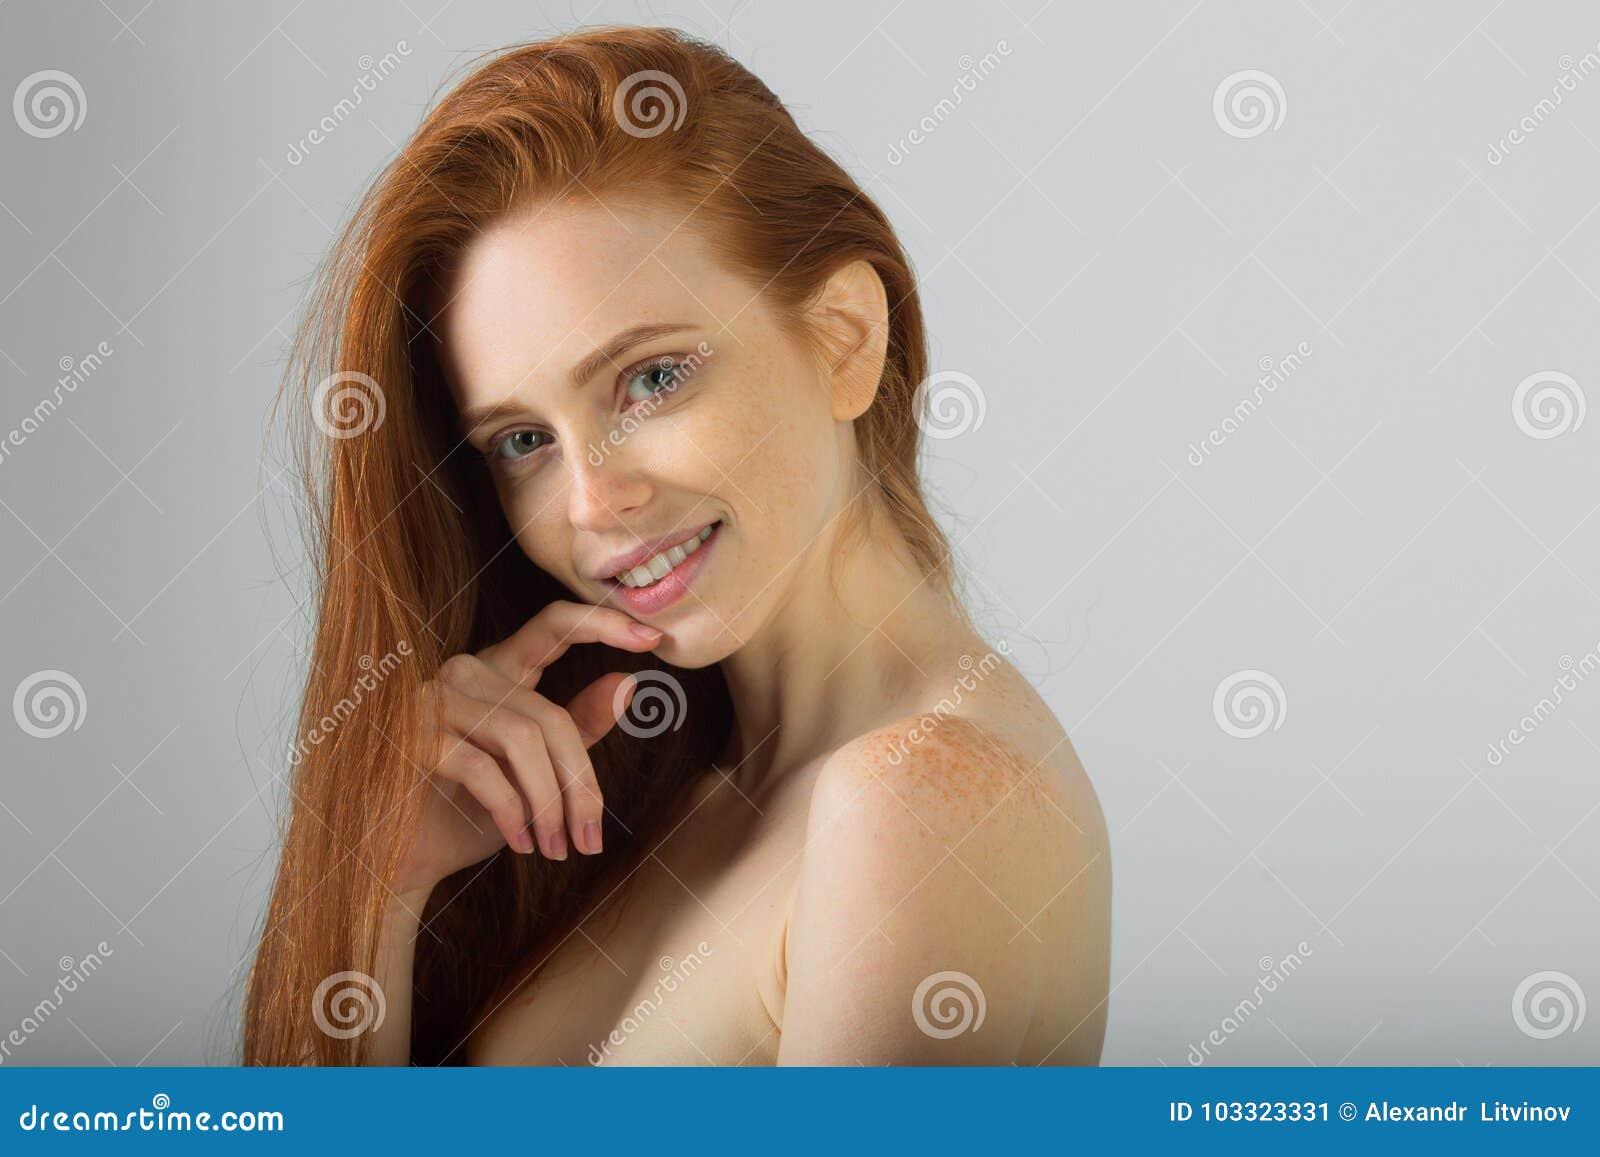 sexy girls omegle